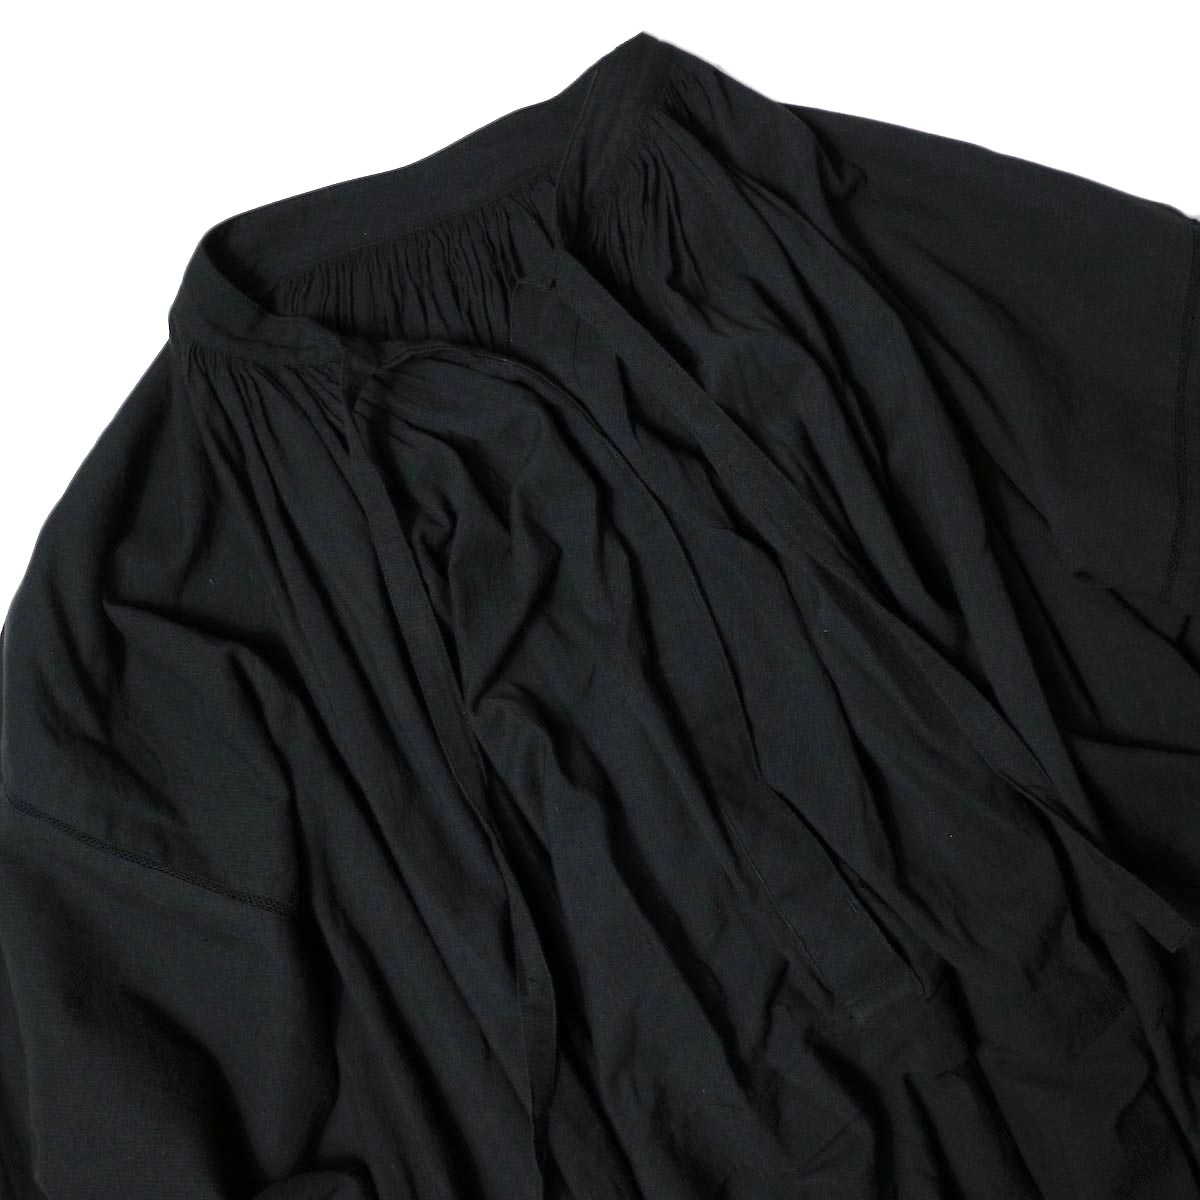 maison de soil / NECK GATHERED DRESS (black) フロント